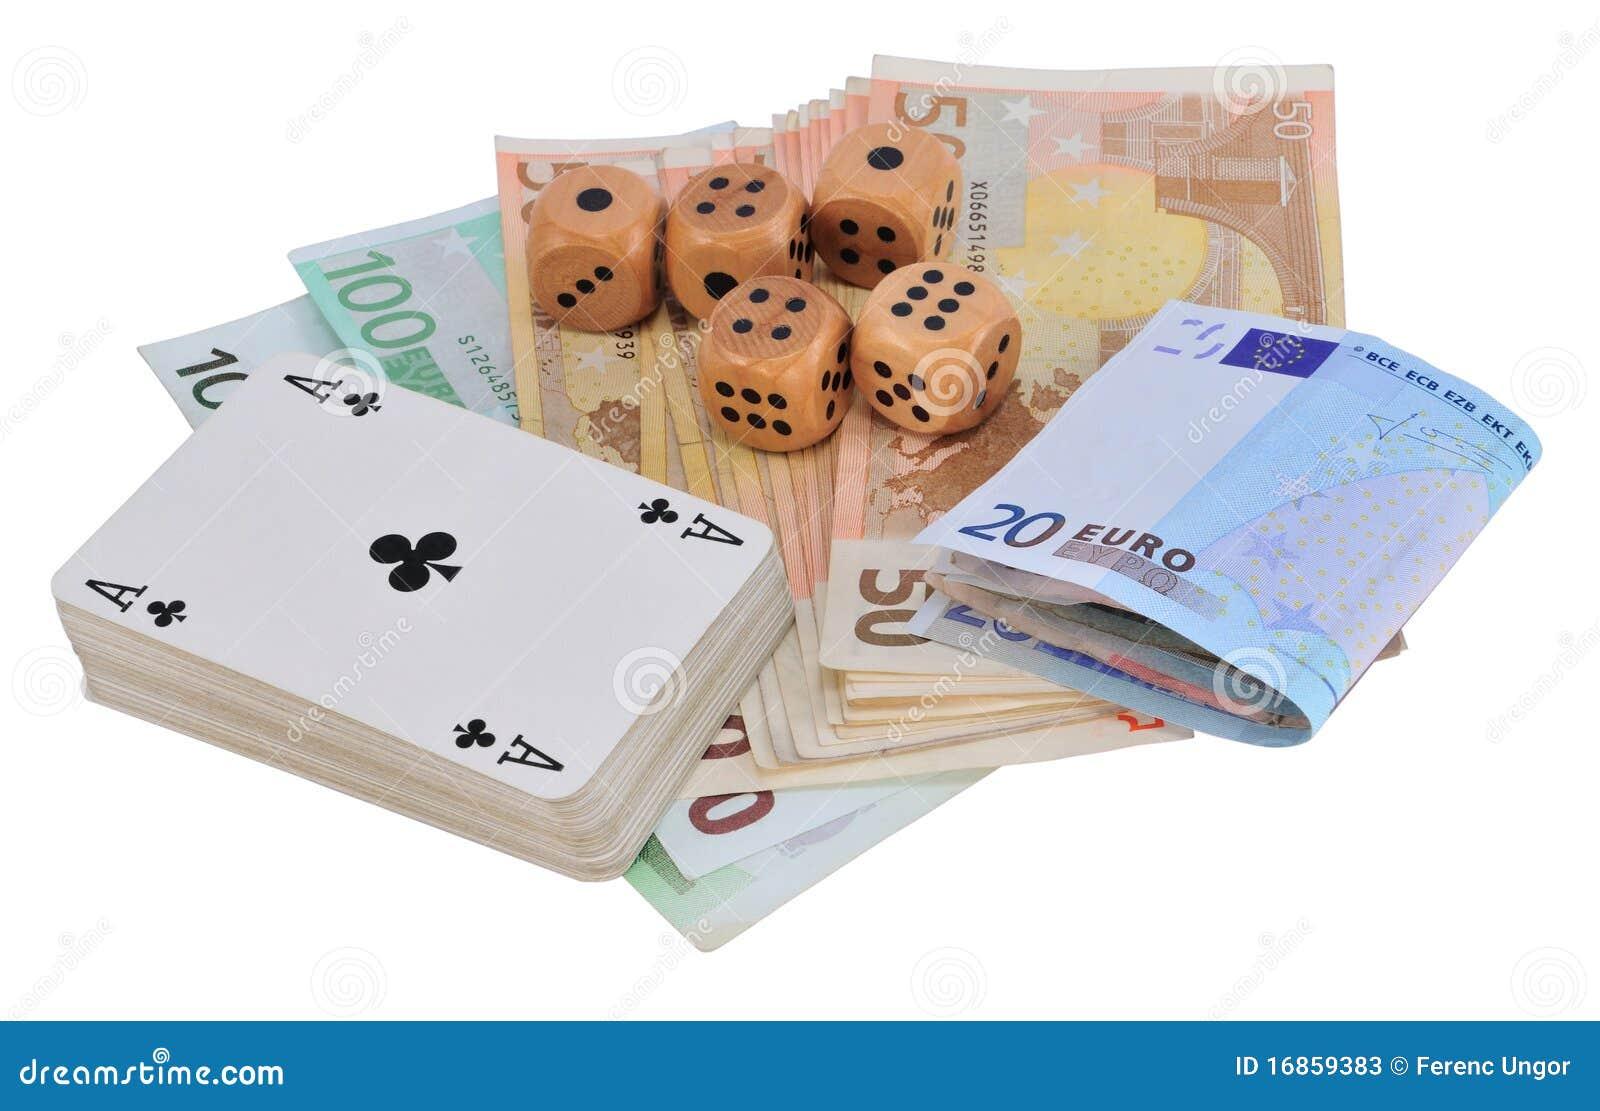 Gamble For Money